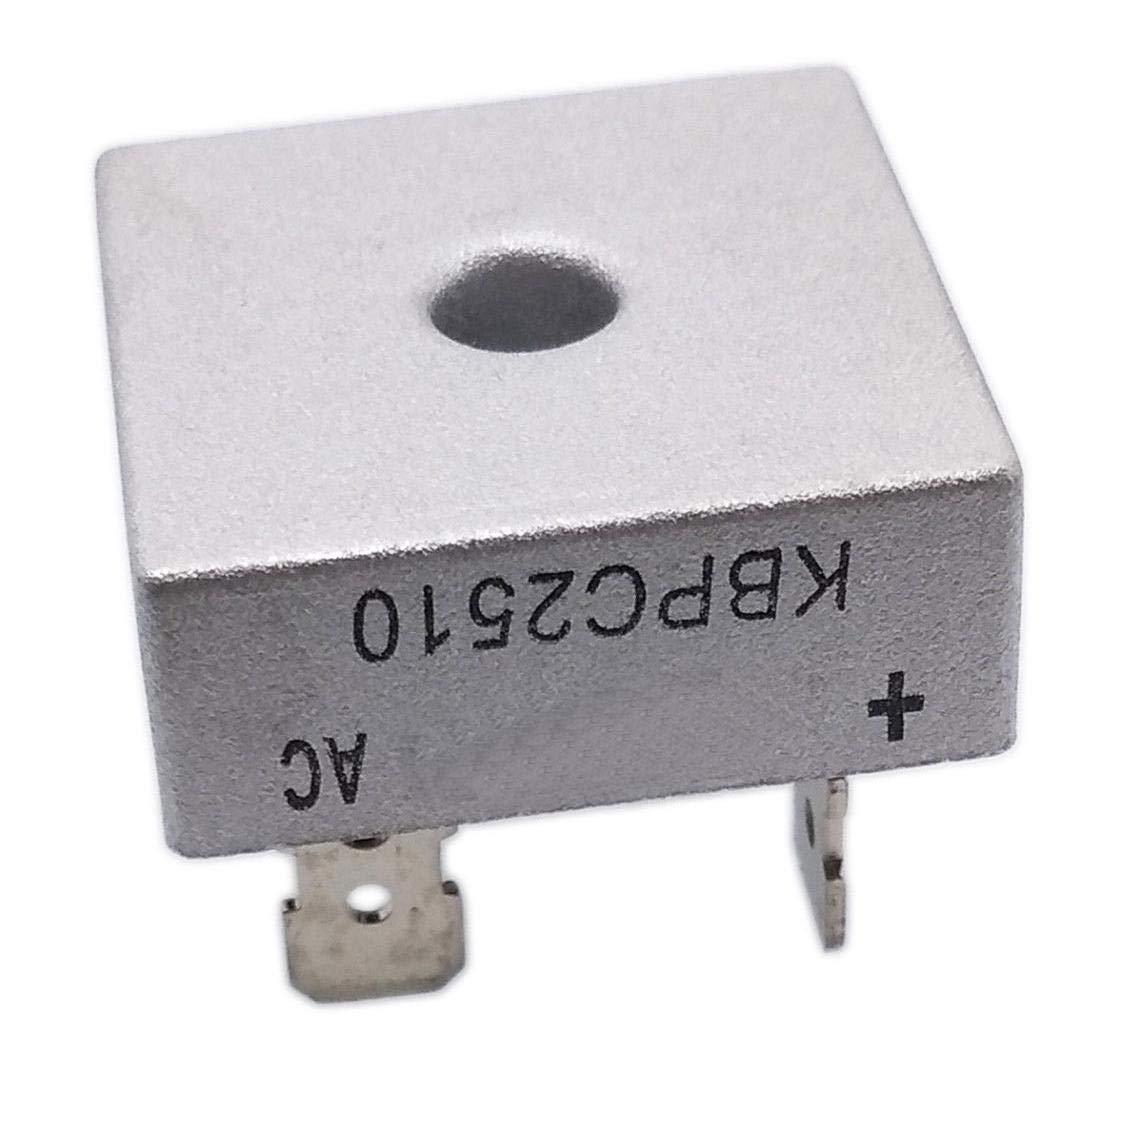 KBPC2510 25A Amp 1000V Volt Diode Bridge Rectifier 28 x 28 x 21mm